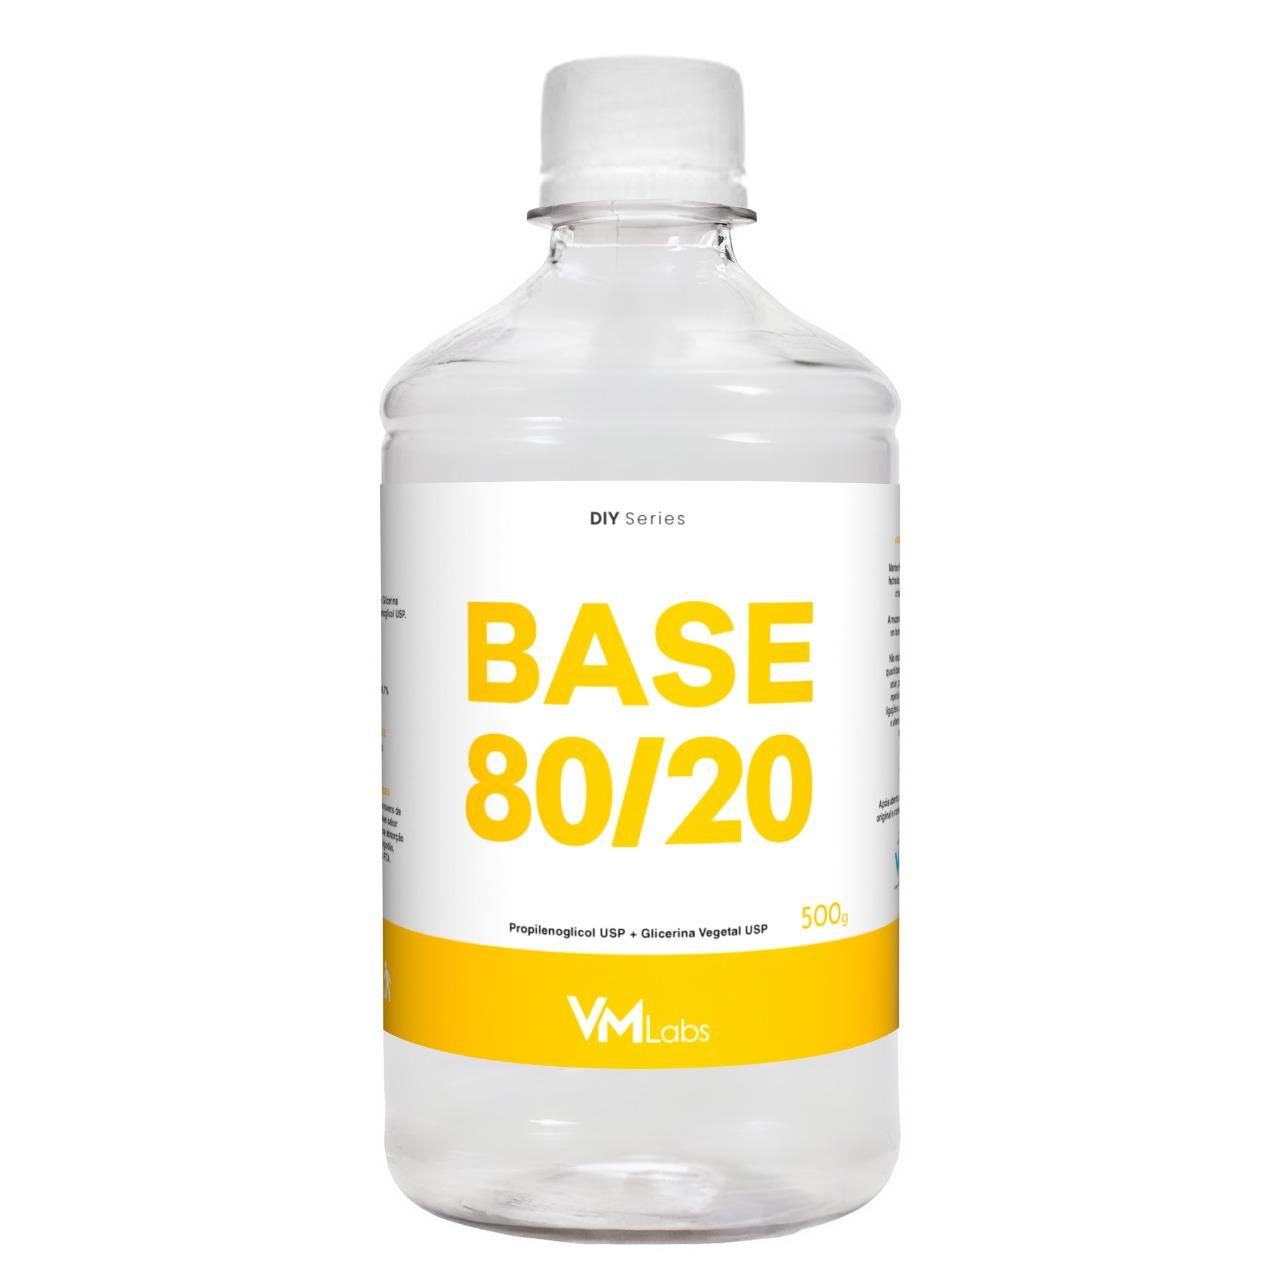 Base Pronta USP 80/20 - 500ml